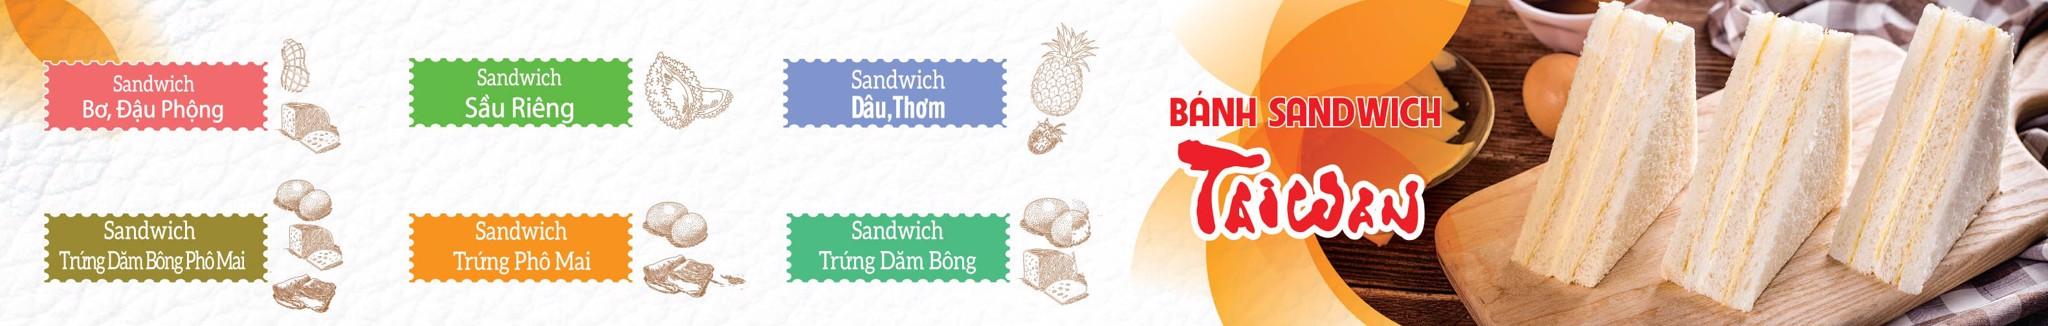 Sandwich Đài Loan